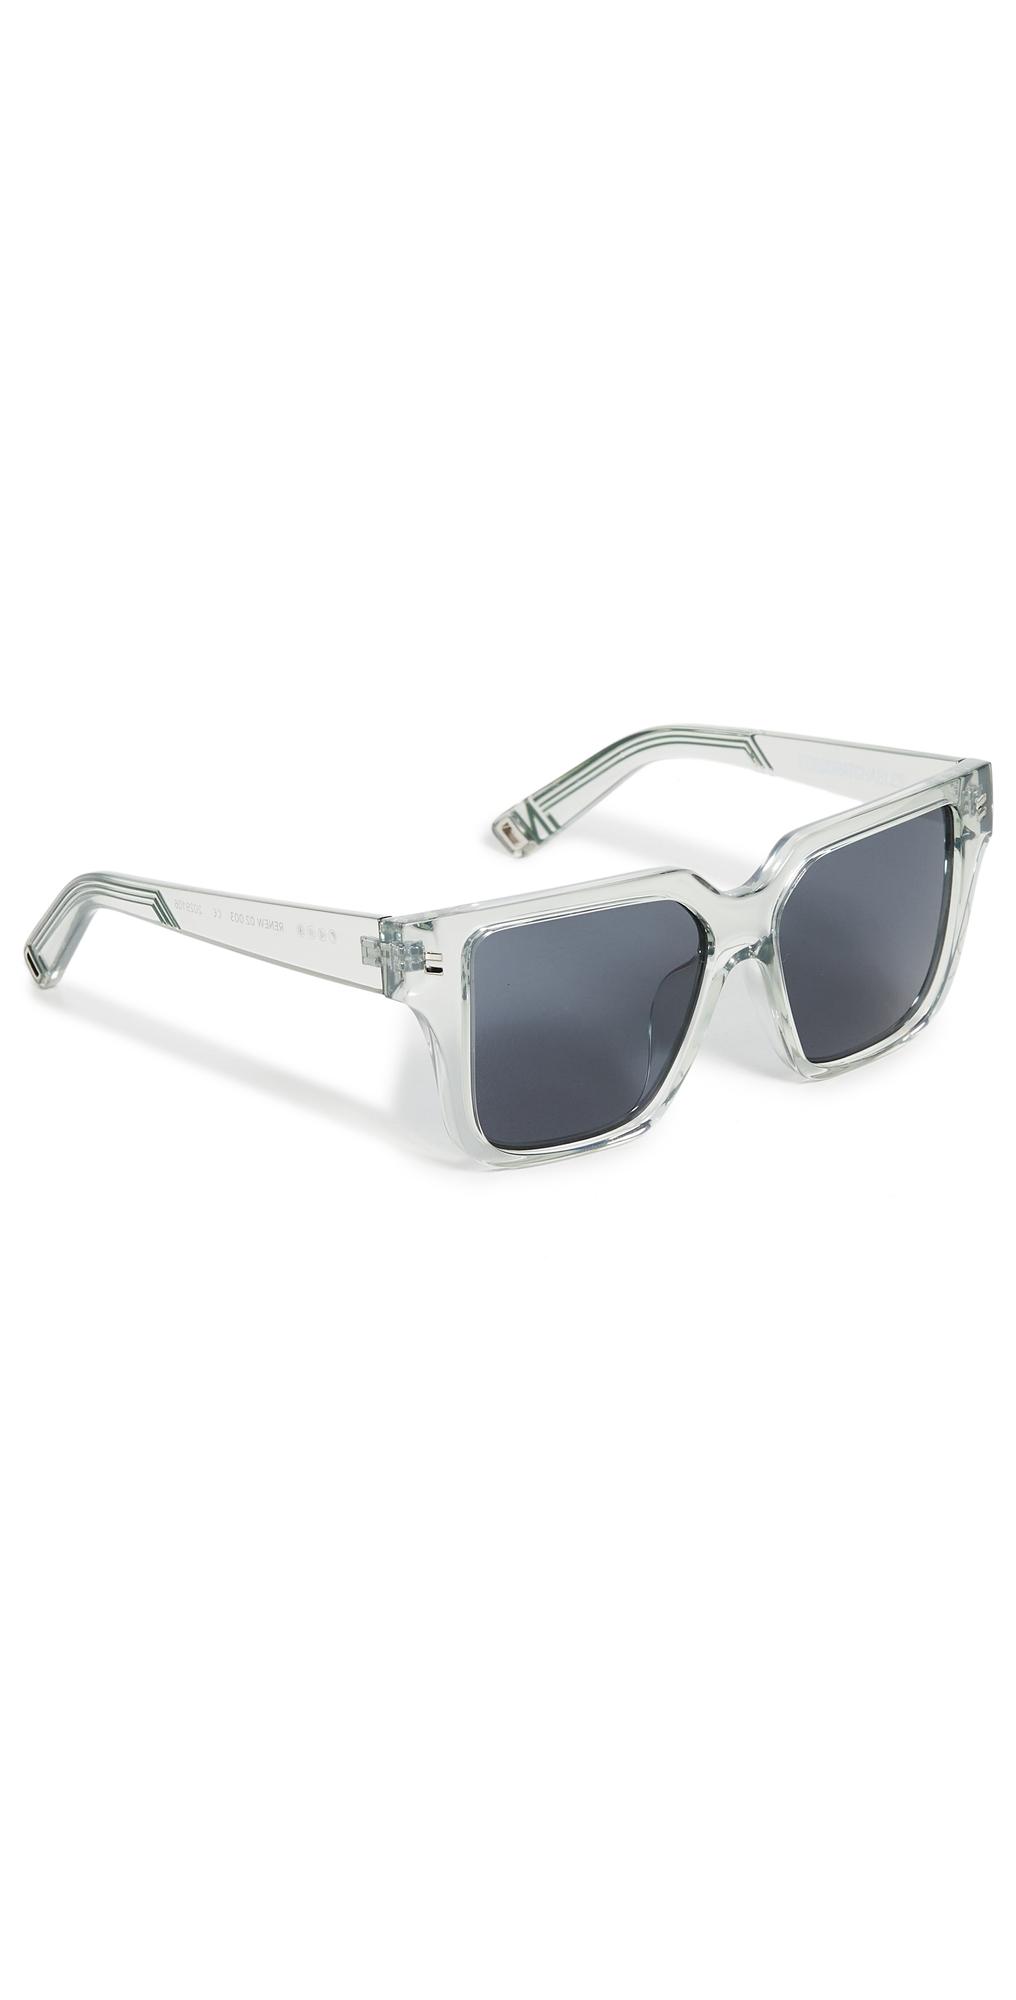 Renew 02 Sunglasses